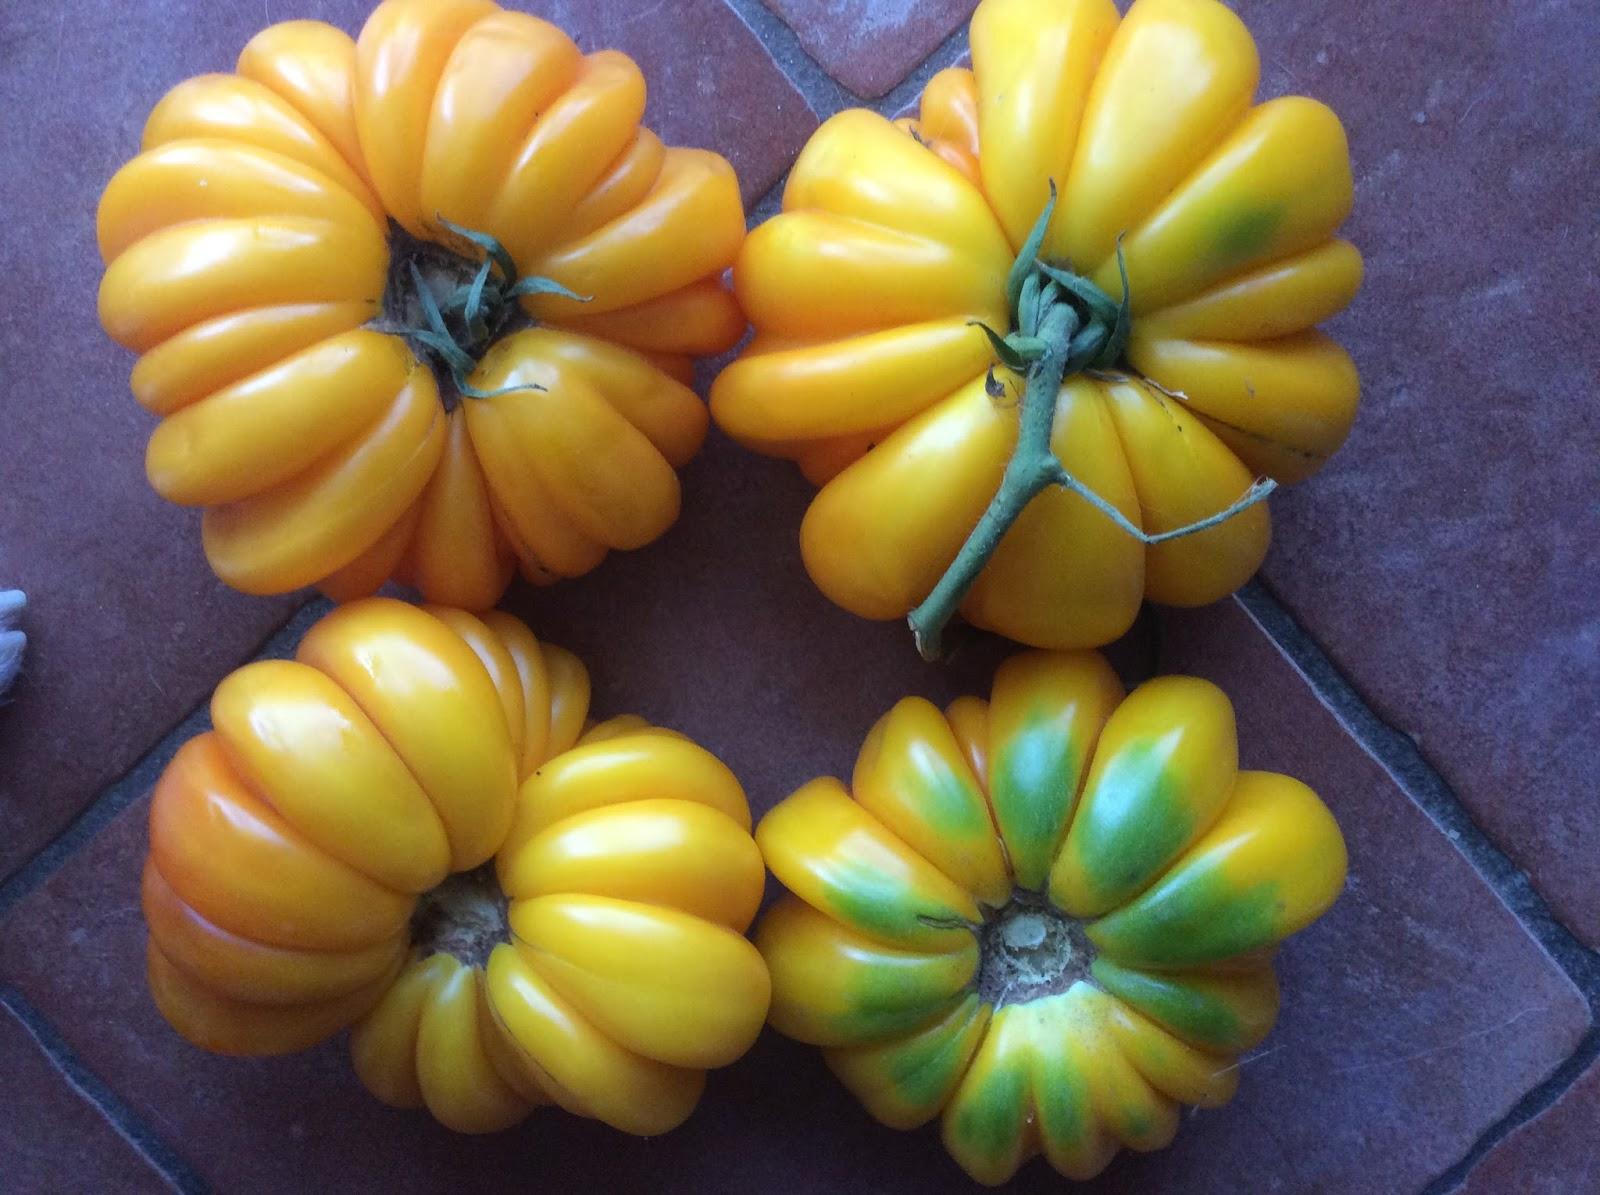 Tree and Twig Farm Blog: Orange and Yellow Tomatoes 2017